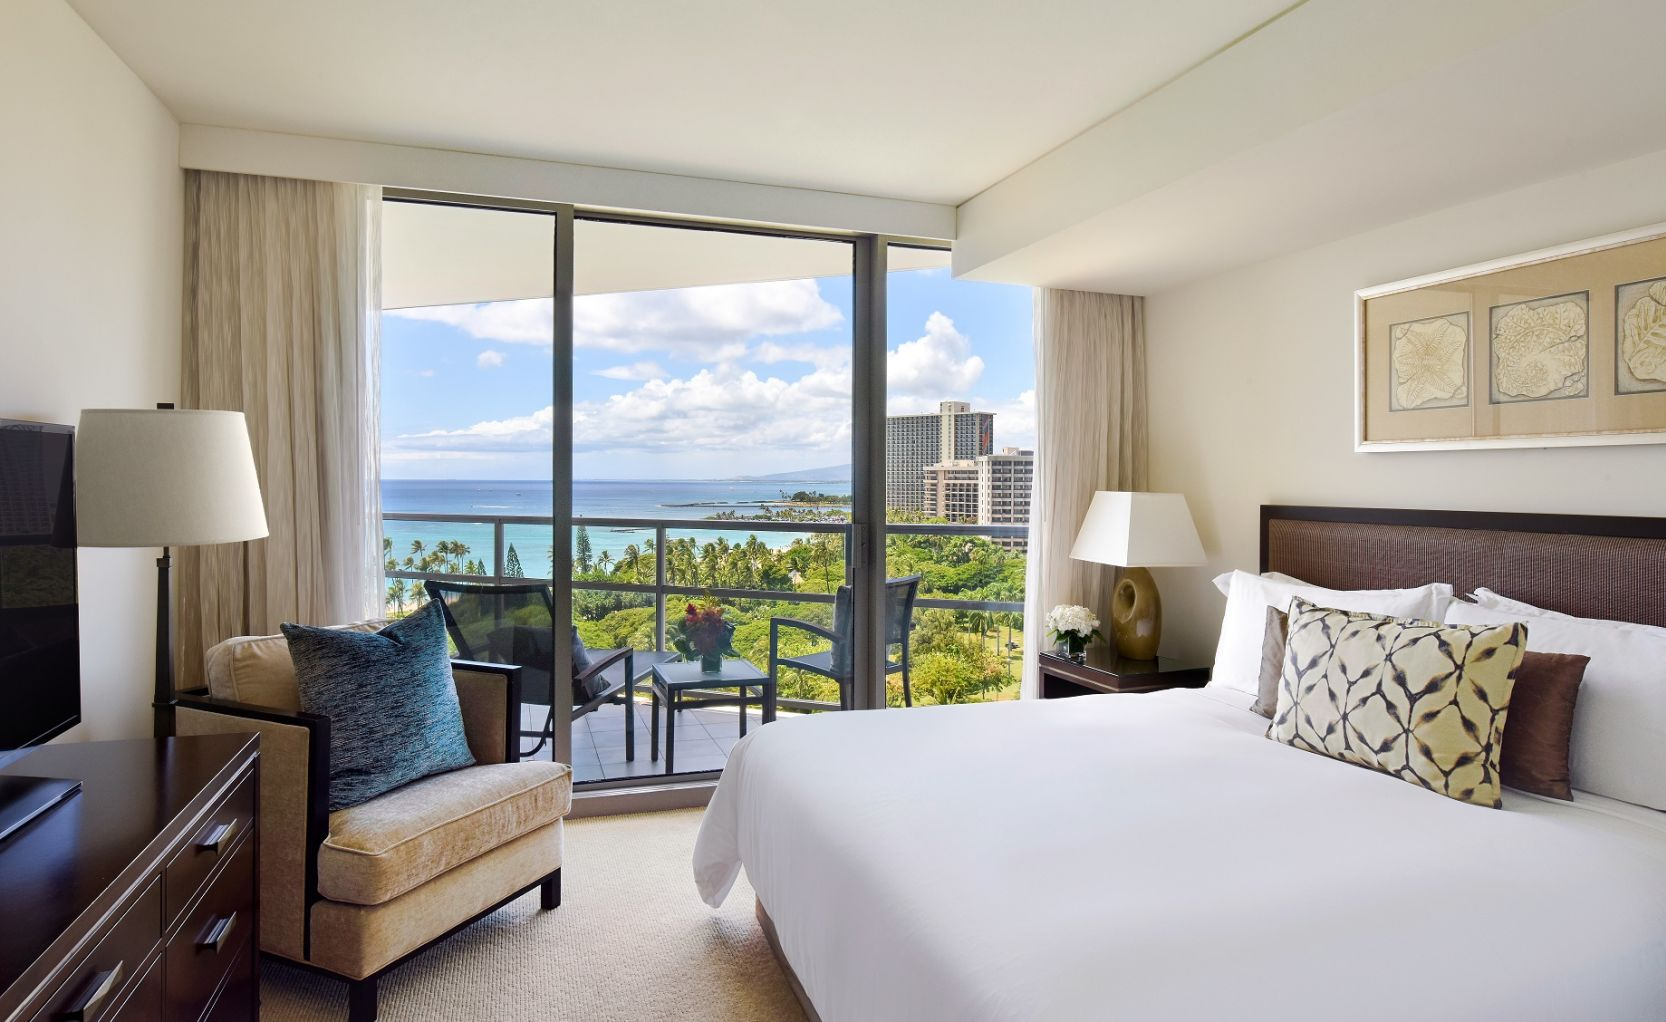 Bedroom with Balcony at Waikiki